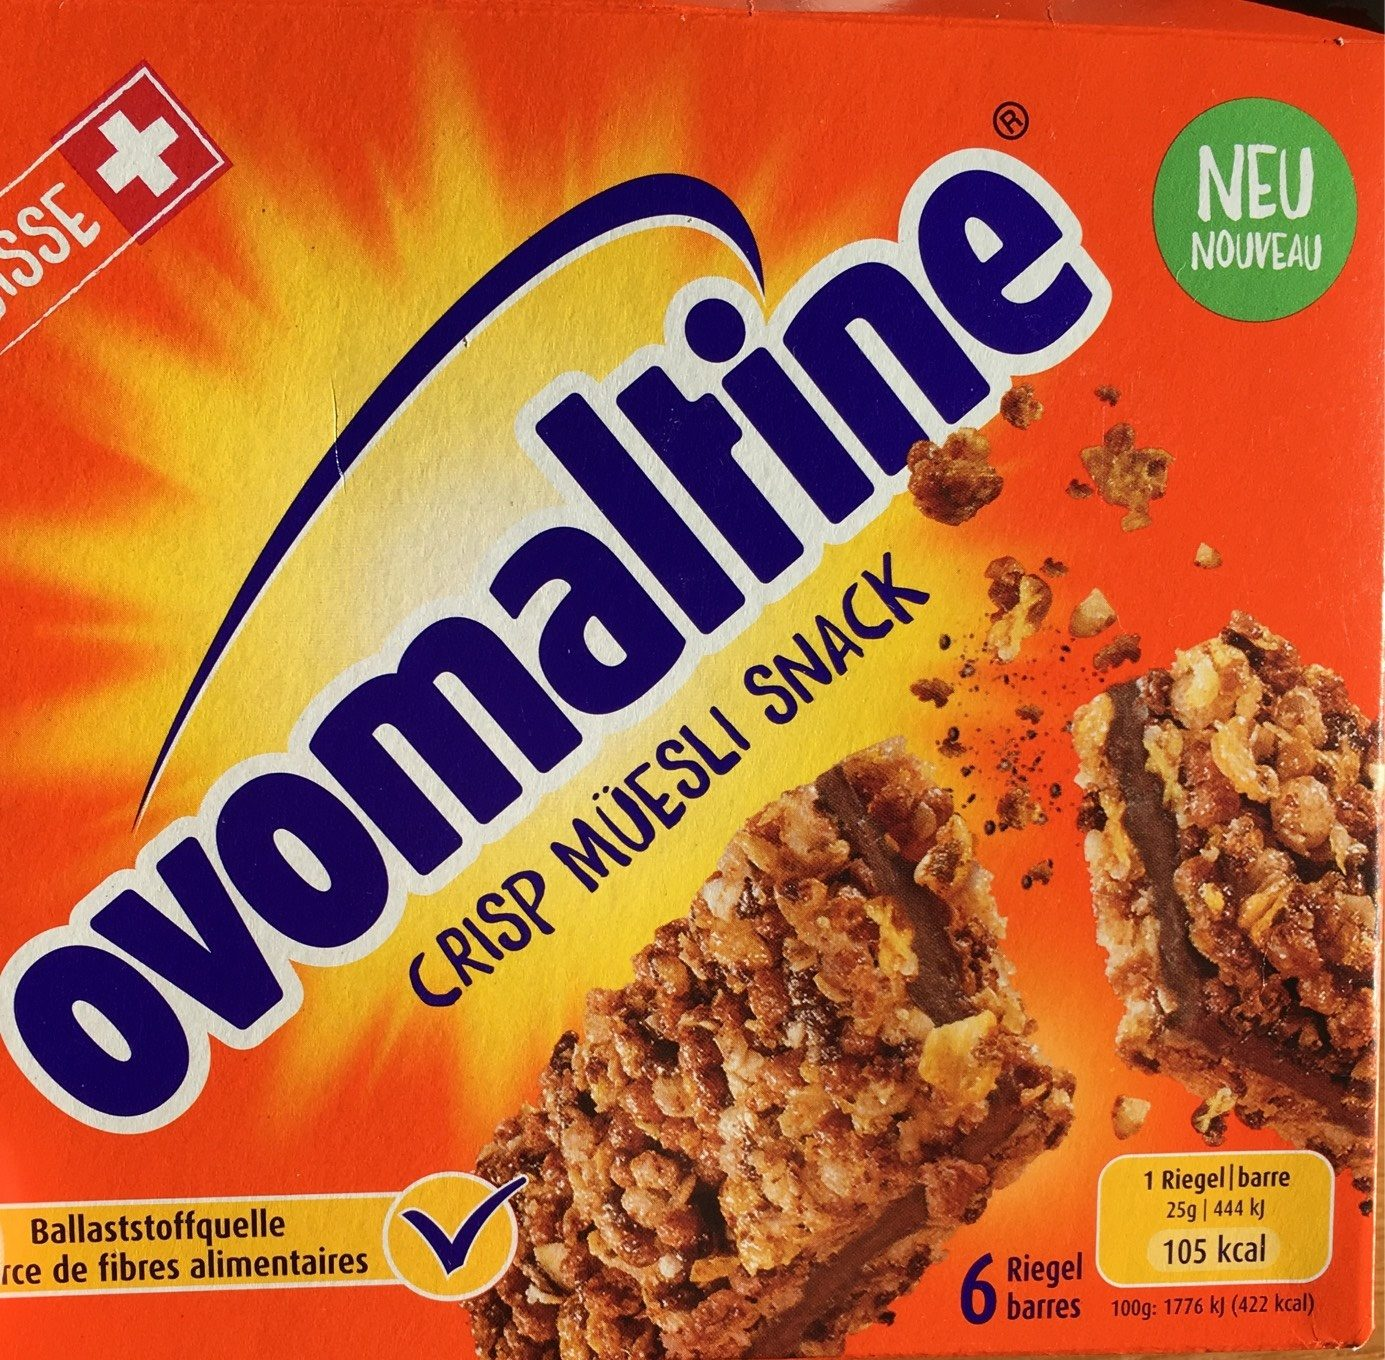 Crisp muesli snack - Product